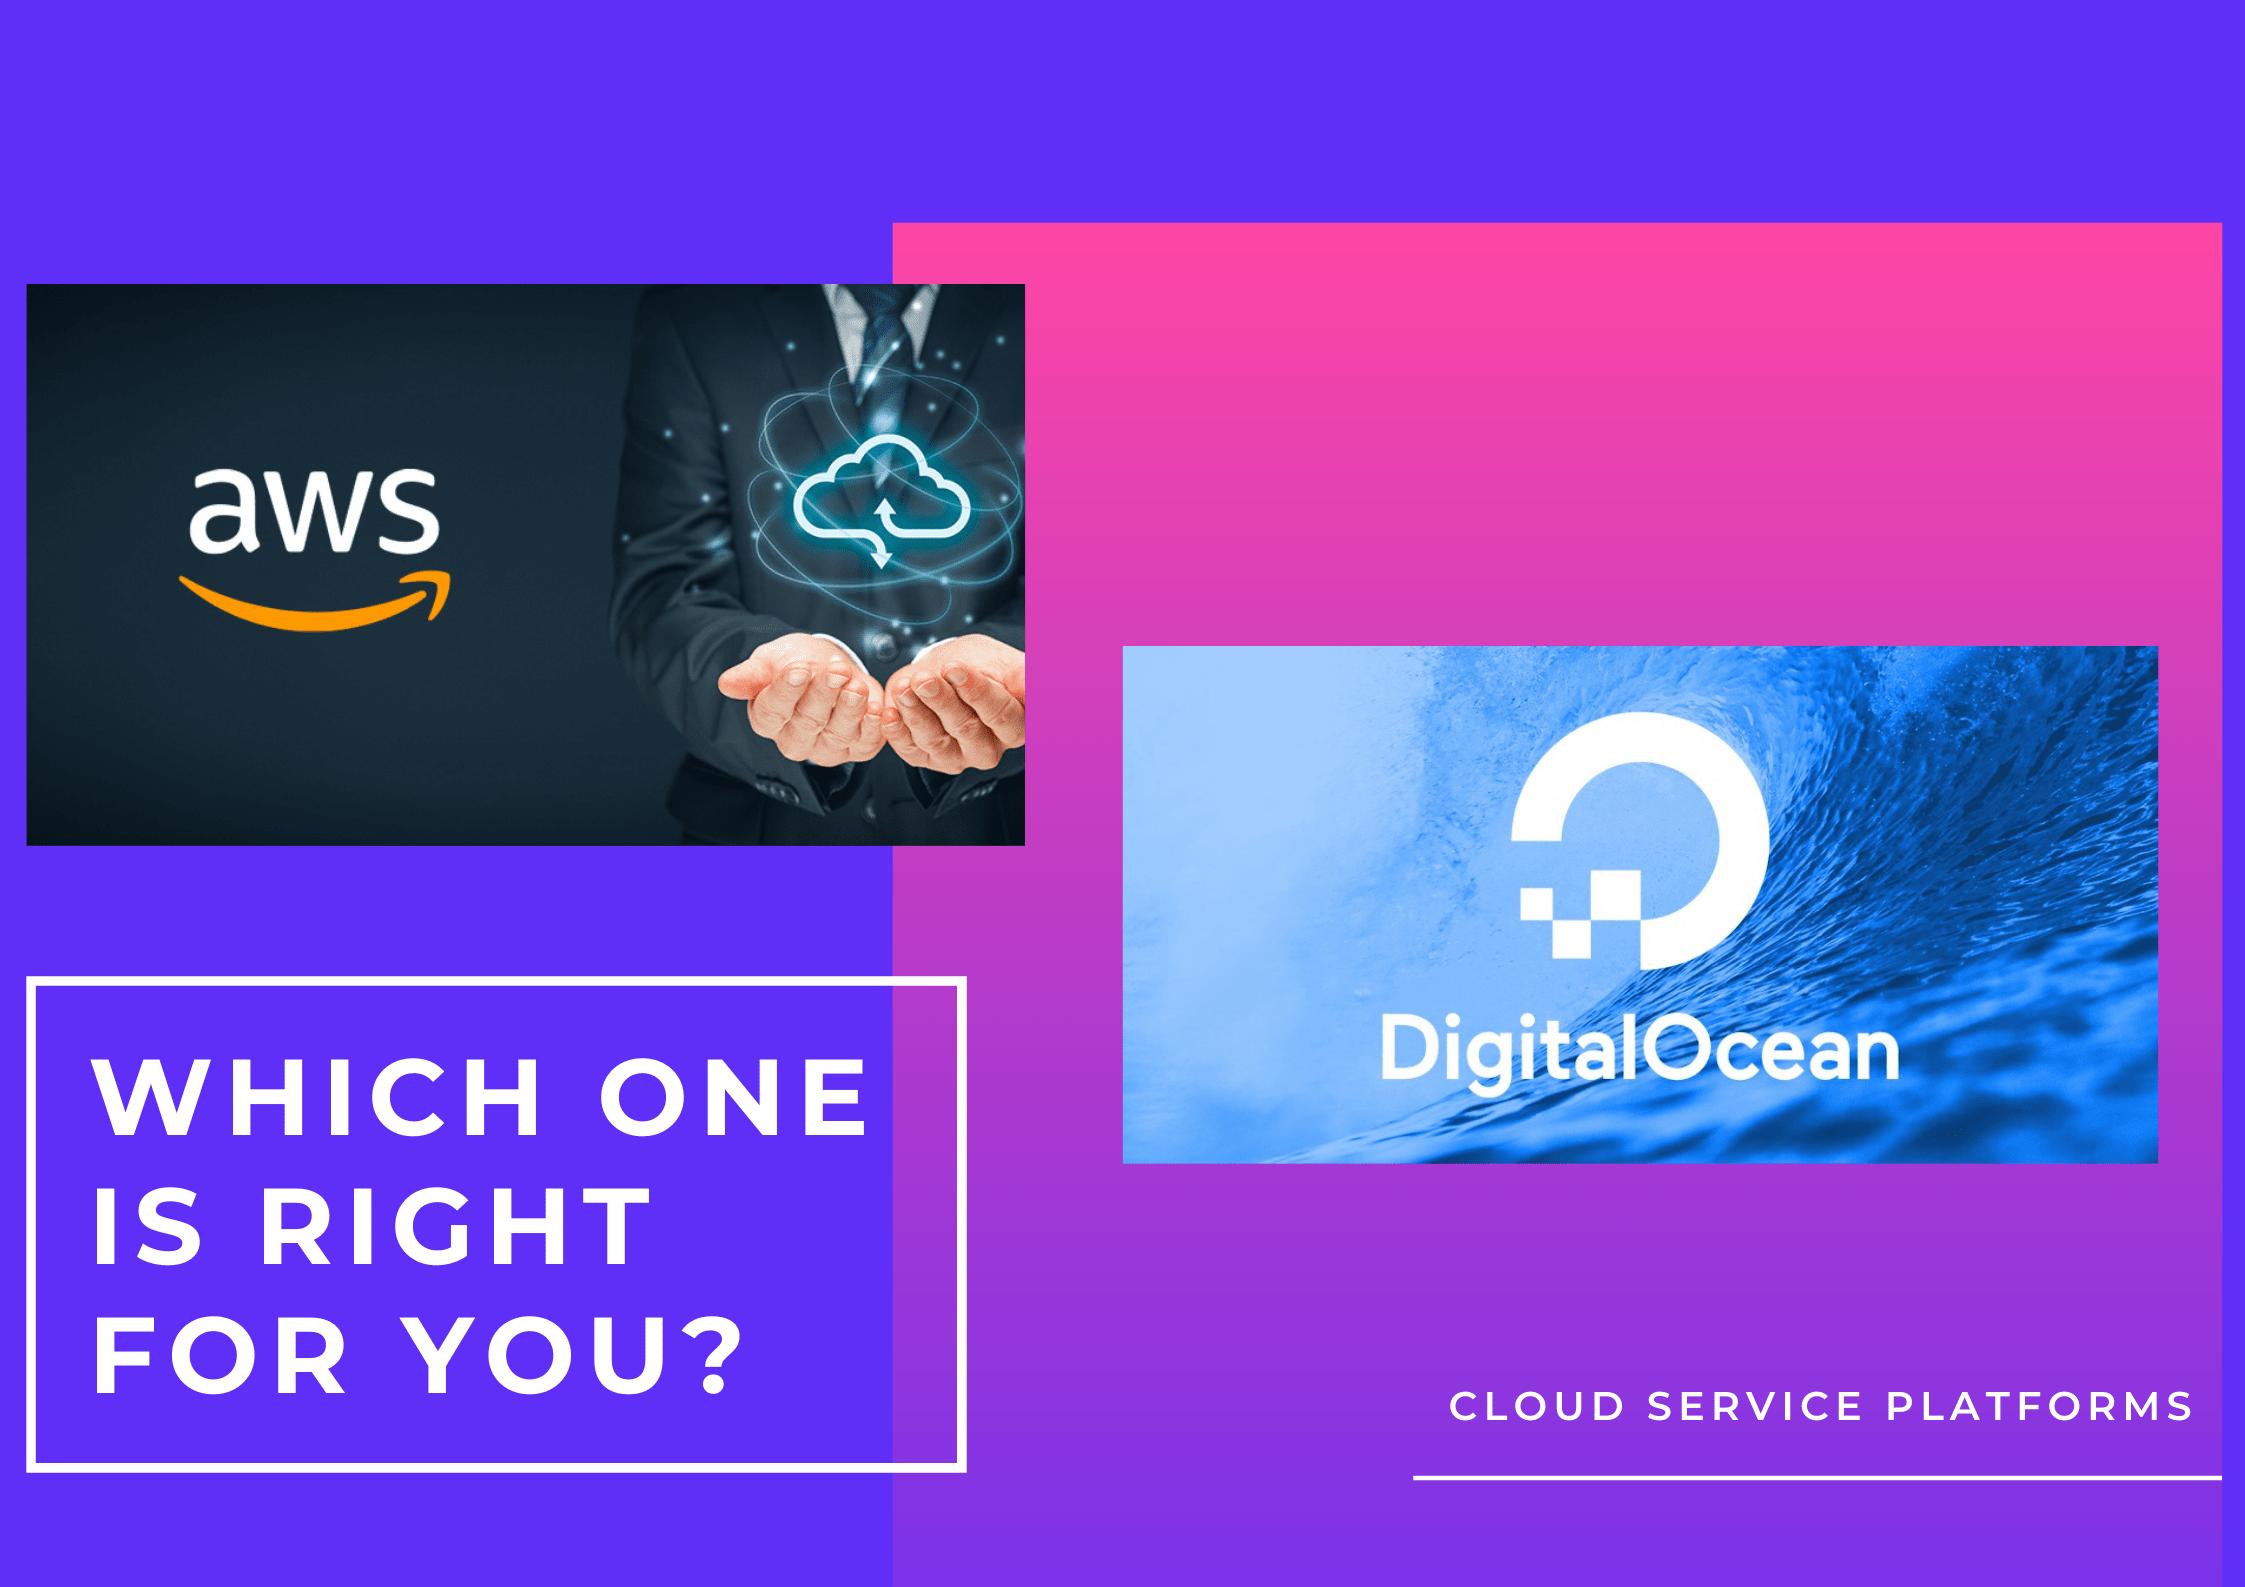 image-1-AWS-vs-DigitalOcean-min.png